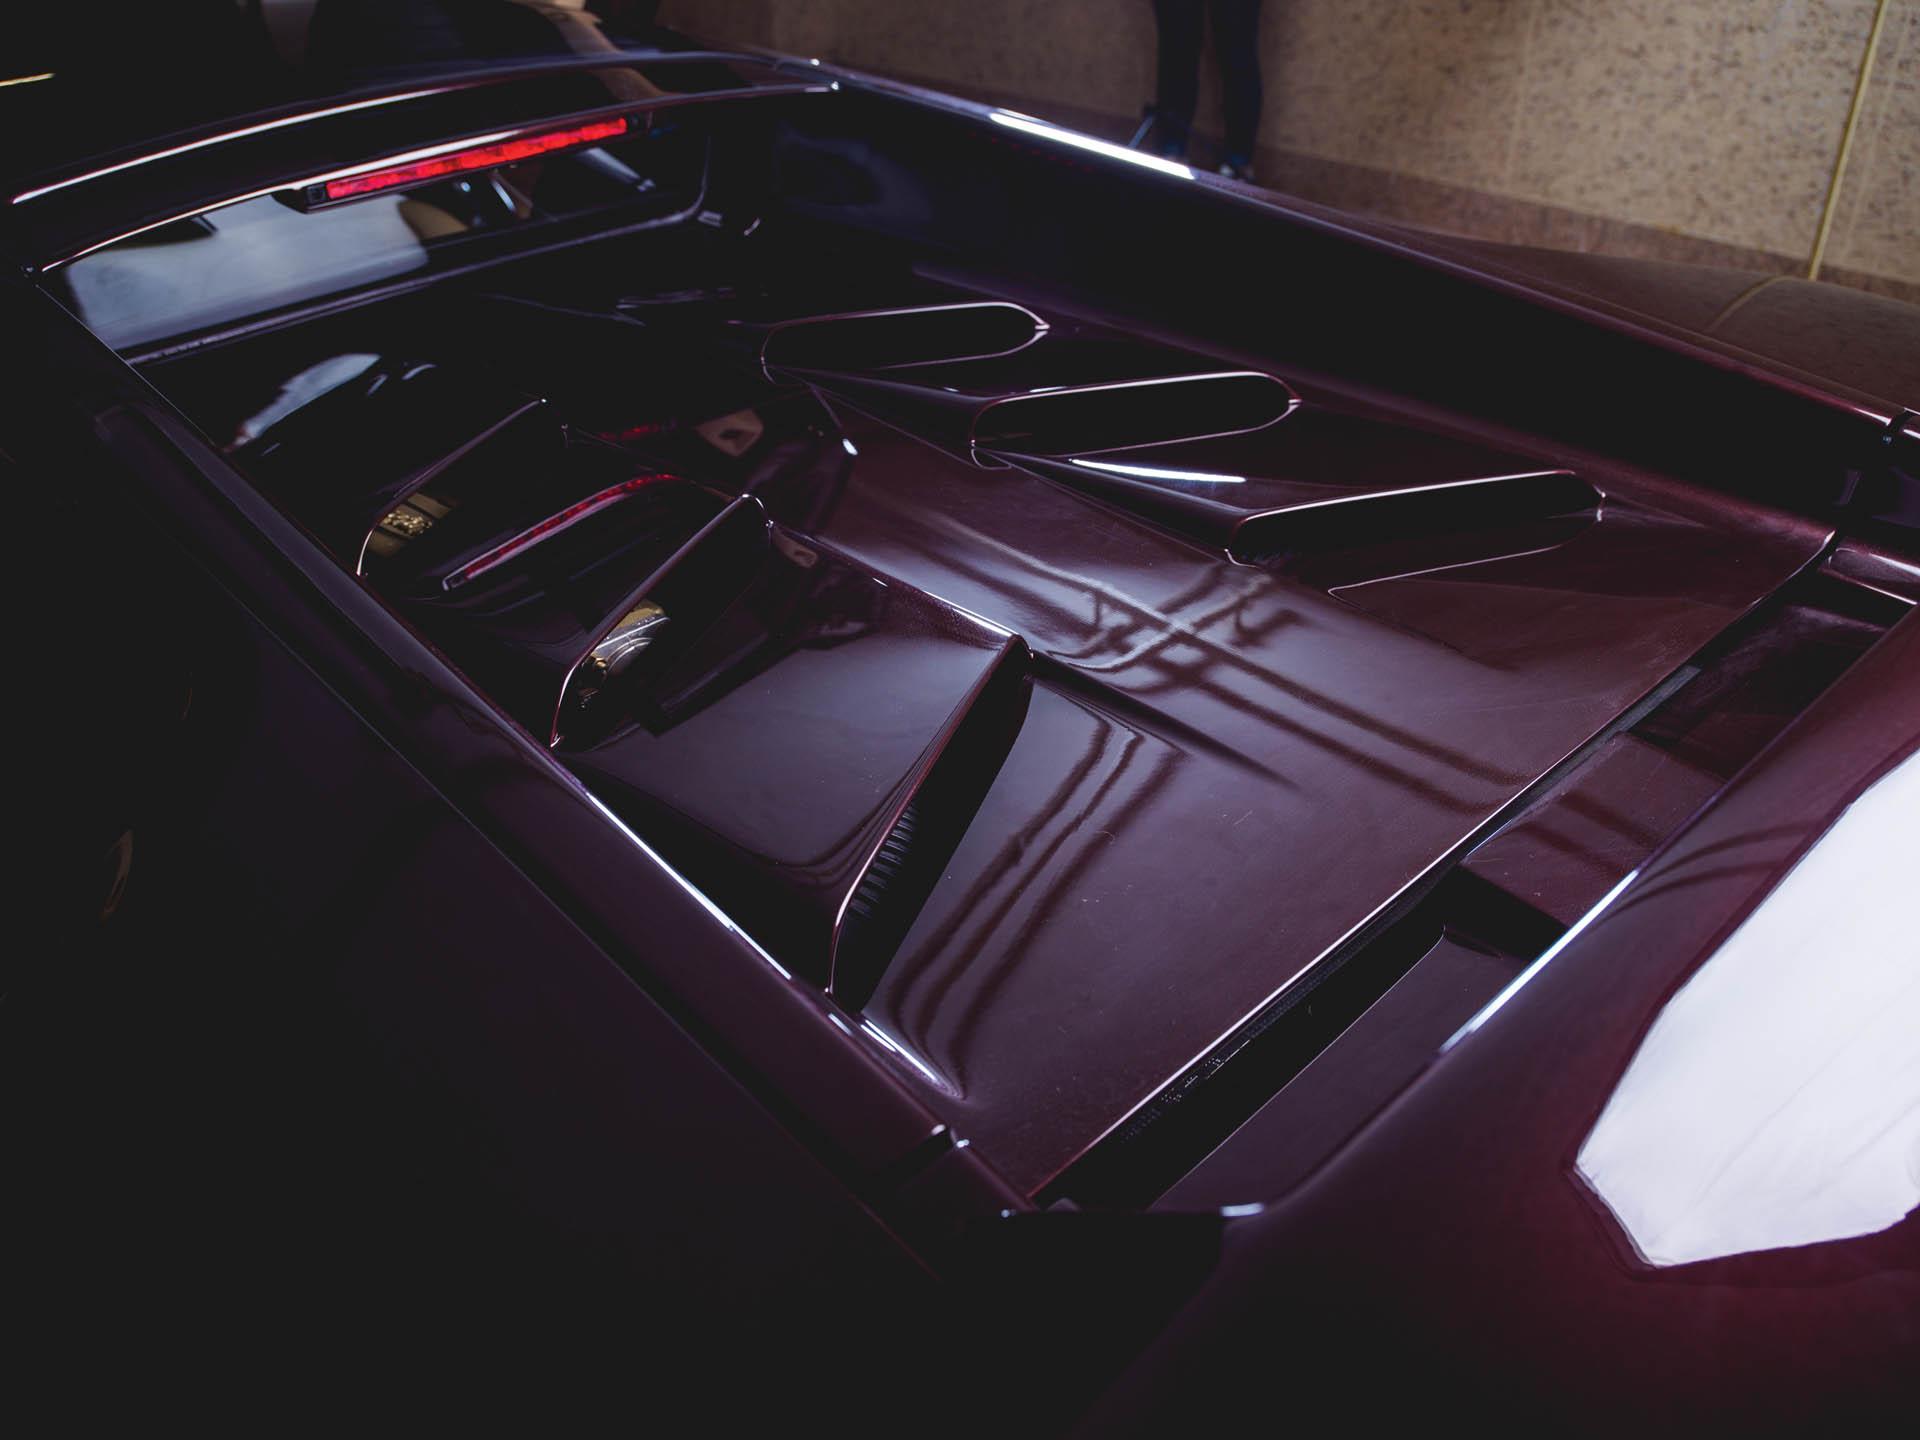 Lamborghini Diablo VT 6.0 SE for sale (16)